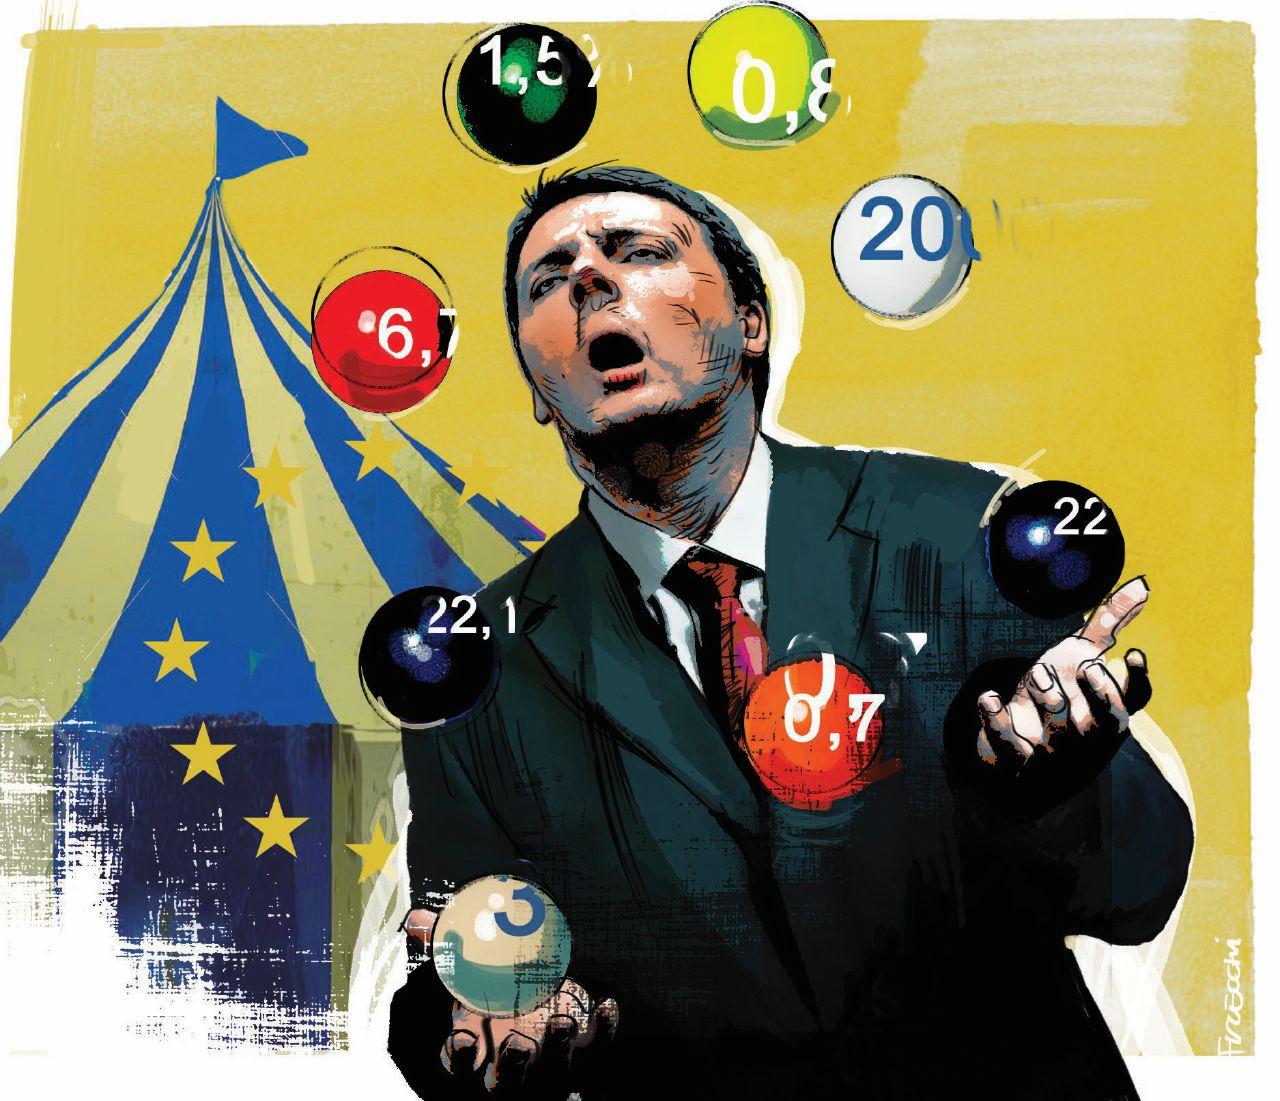 Banche, referendum, guerra e Rai: ecco le 15 bugie di Renzi